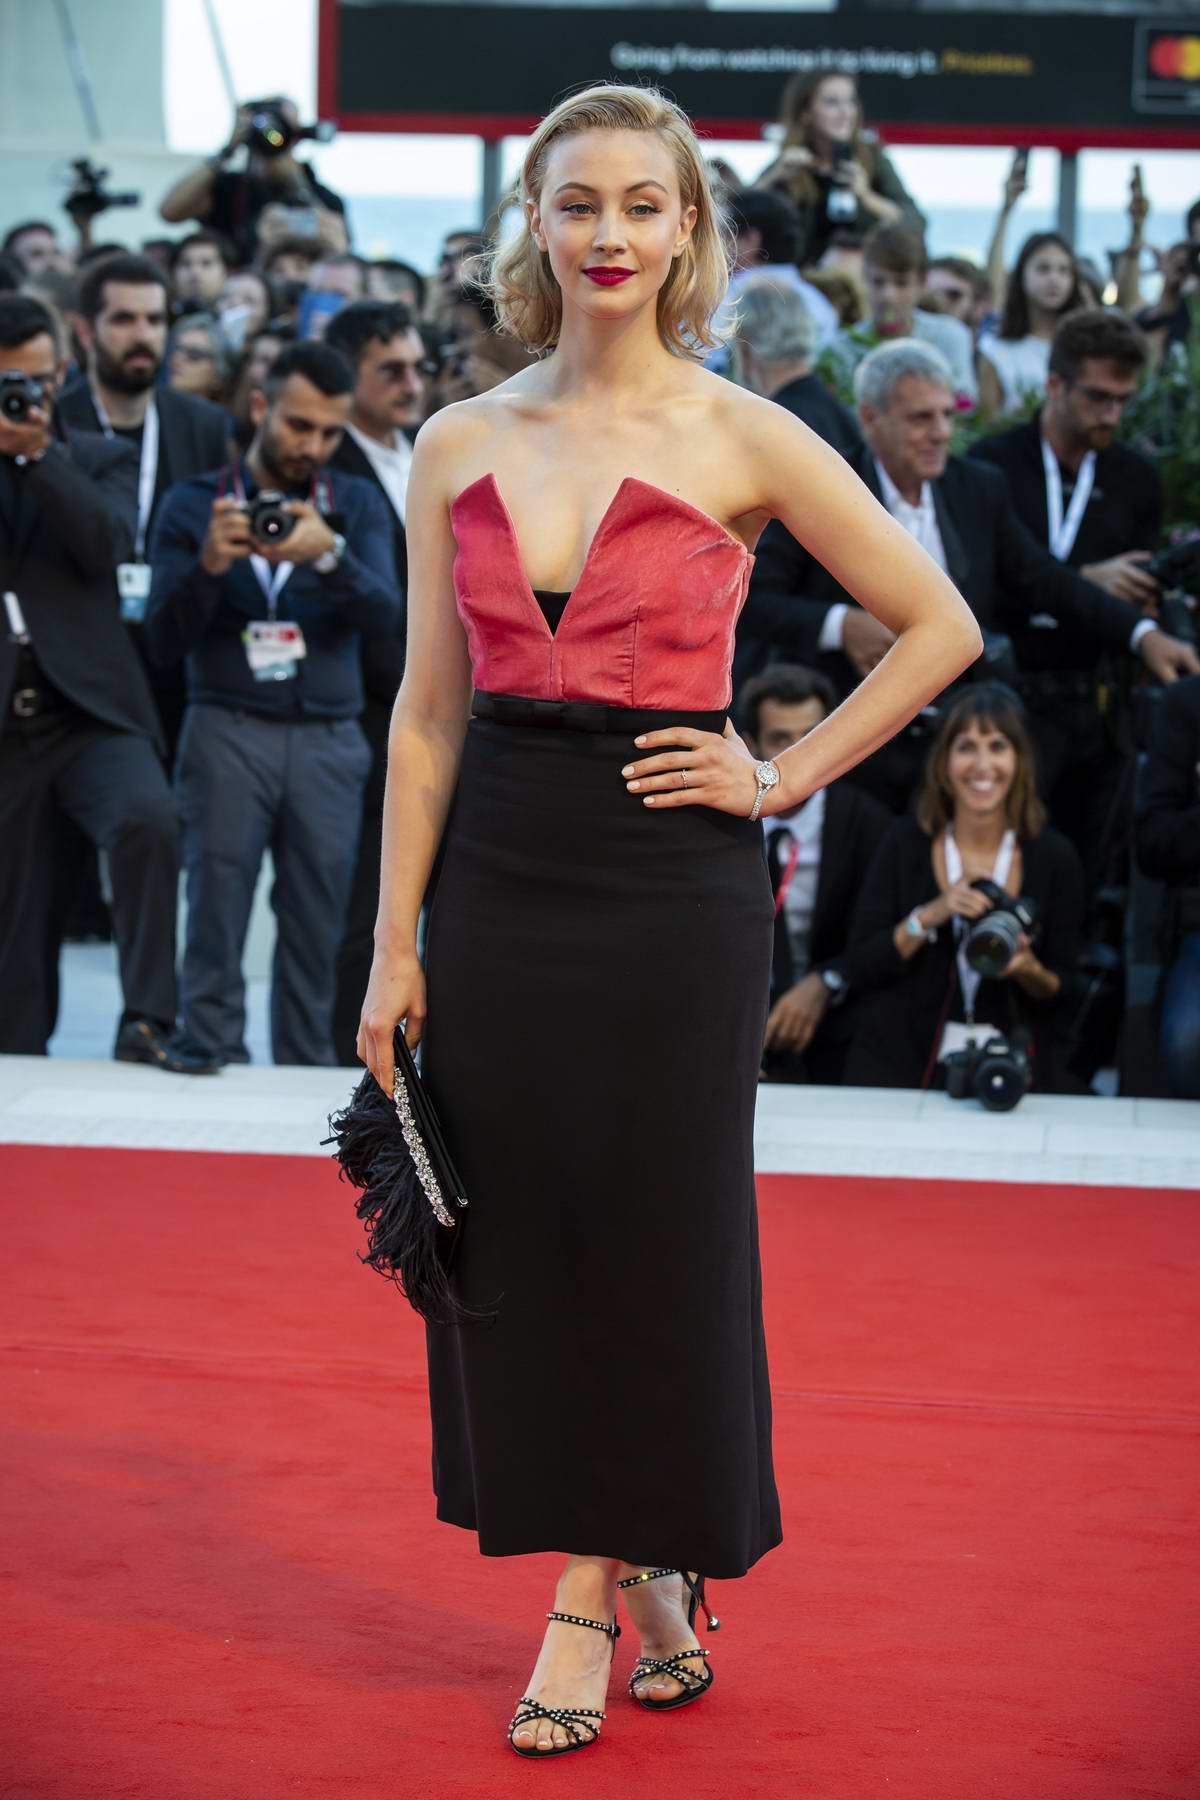 Sarah Gadon attends 'Vox Lux' premiere during 75th Venice Film Festival in Venice, Italy